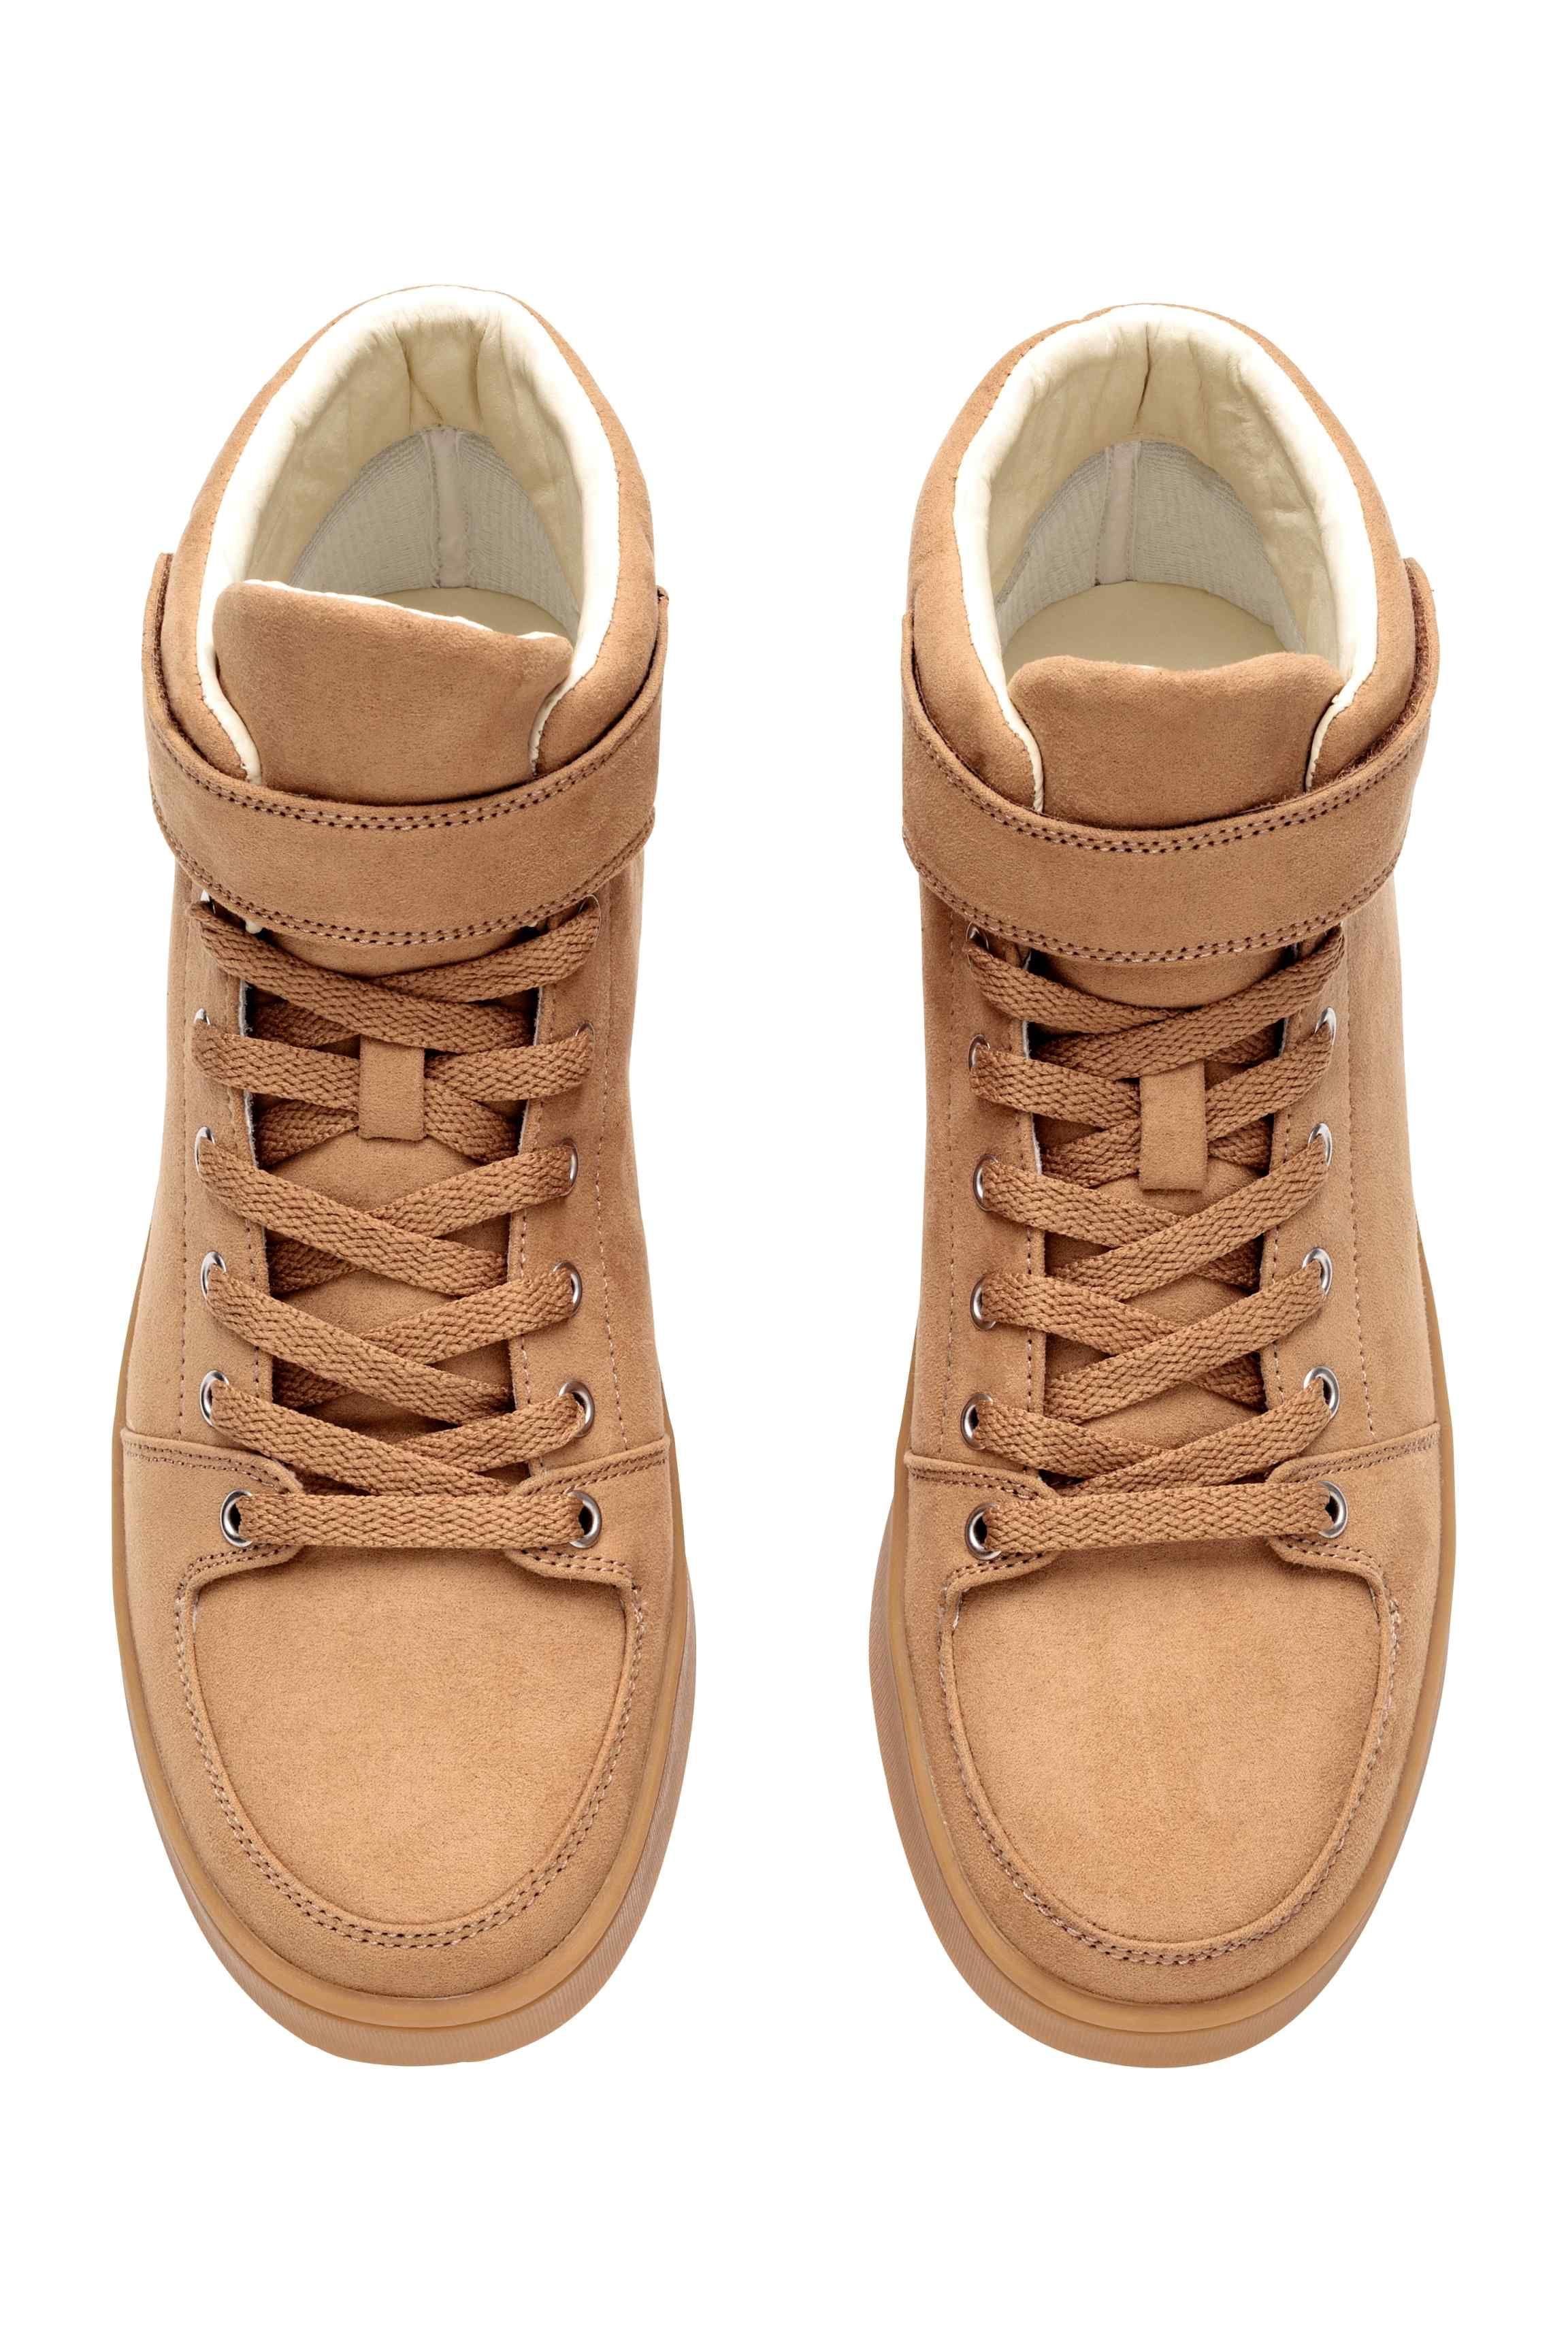 Buty Sportowe Do Kostki Bezowy Ona H M Pl Platform Sneakers High Top Sneakers Top Sneakers